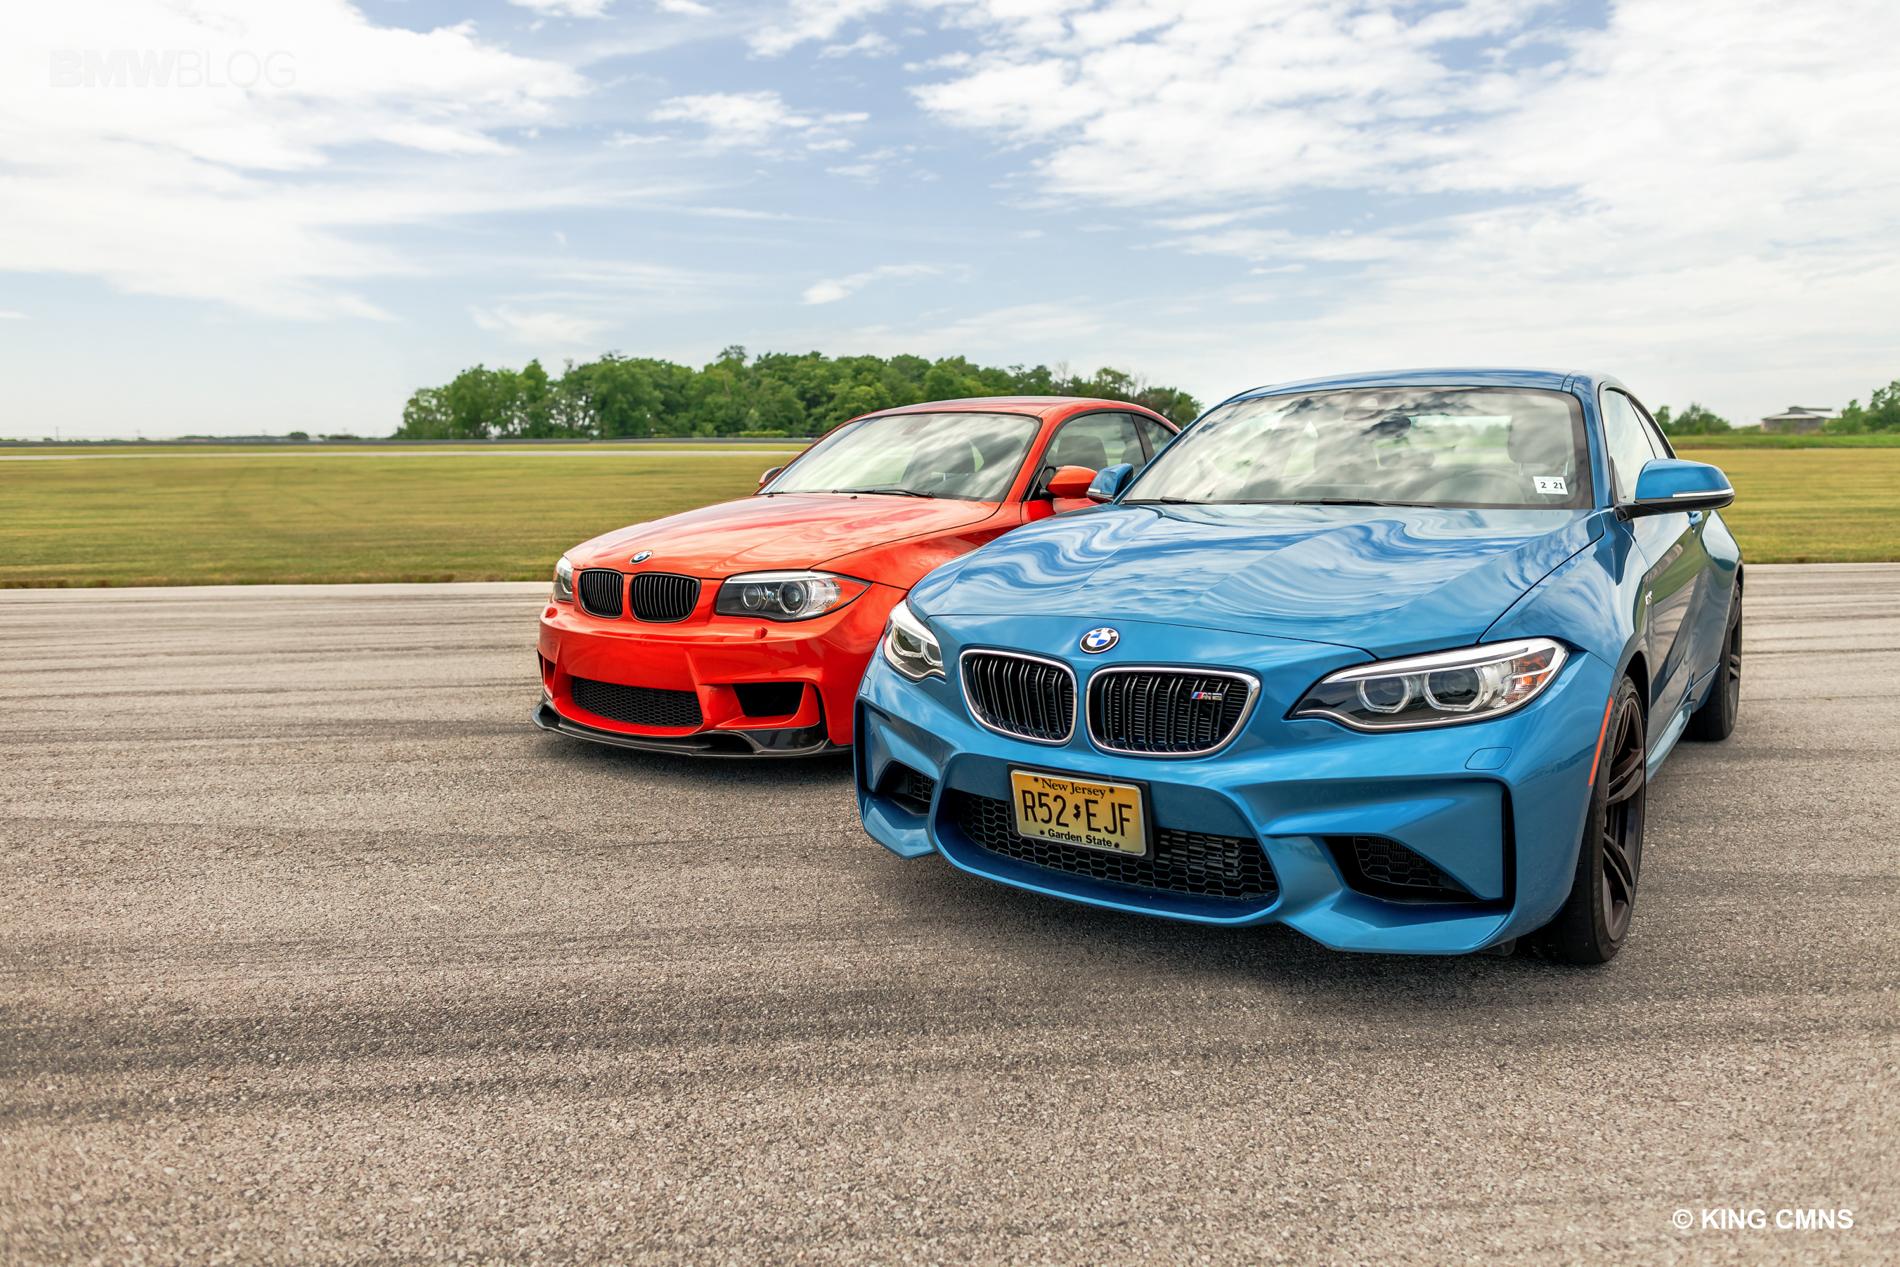 BMW M2 vs BMW 1M 24